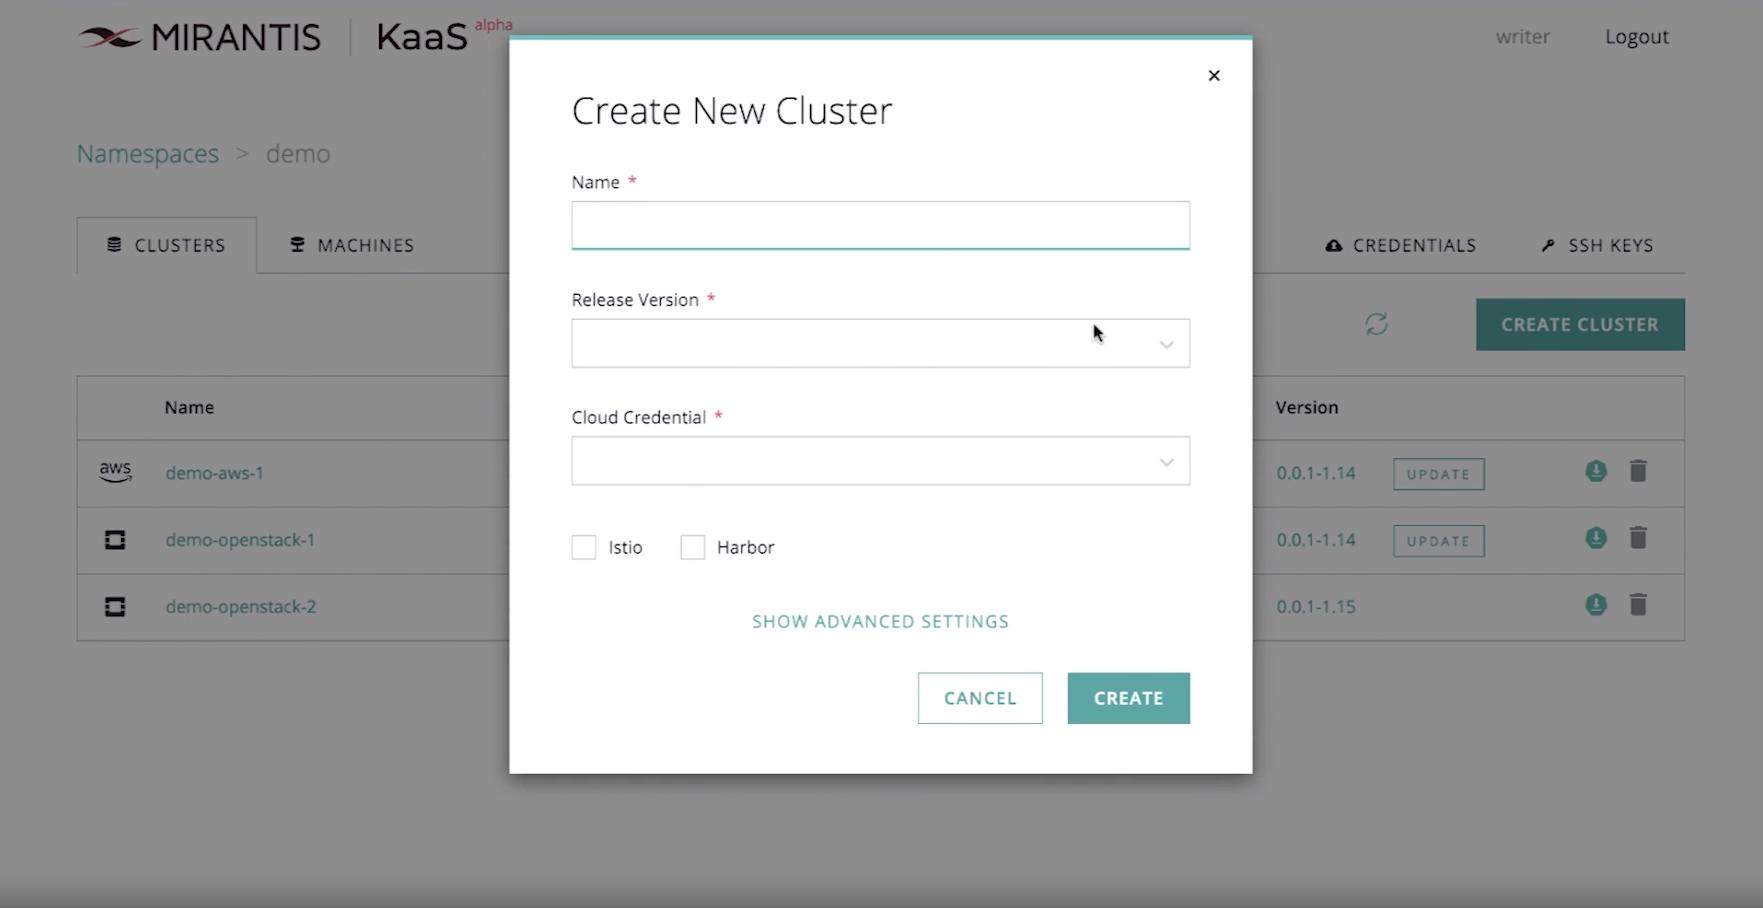 kaas create new cluster